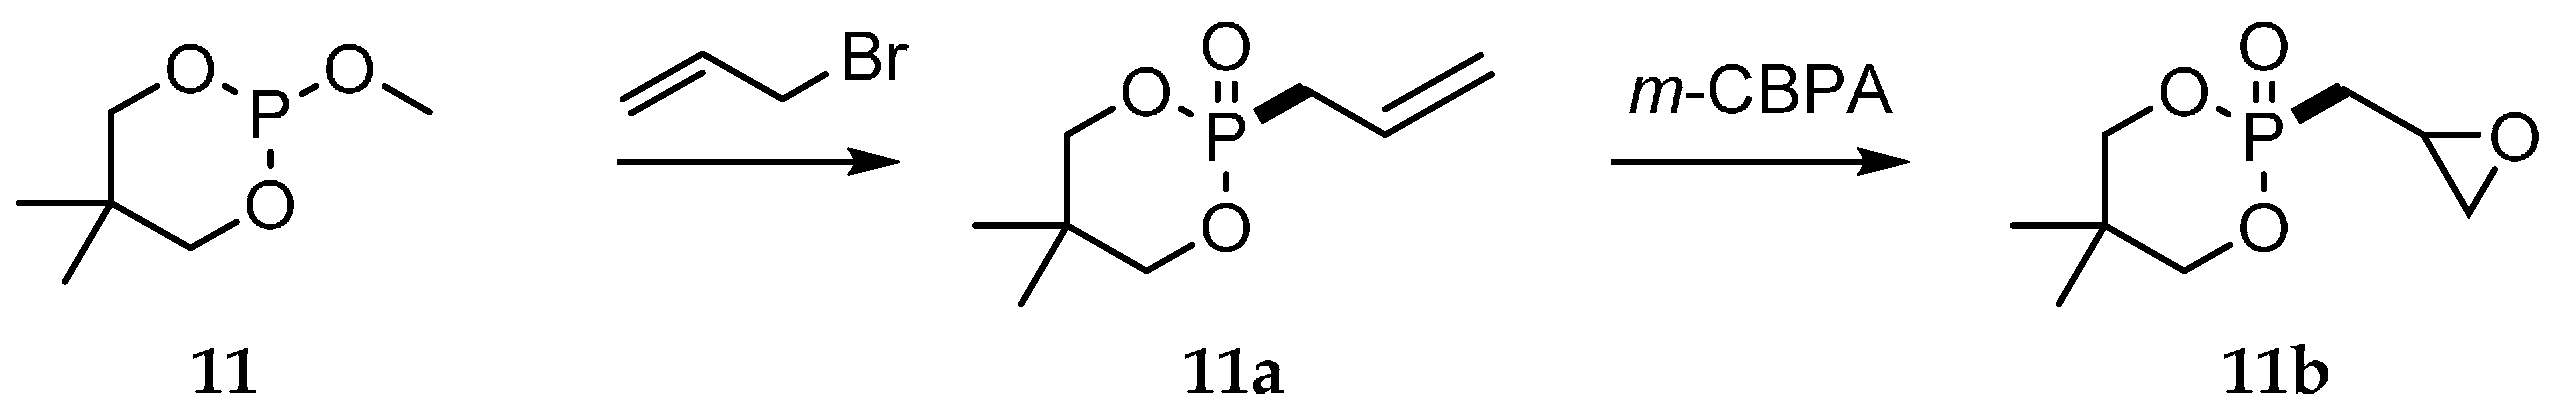 Materials Free Full Text Recent Developments In Organophosphorus Hf Data Diagrams O 2 Meta Dibromobenzene 10 00784 Sch001